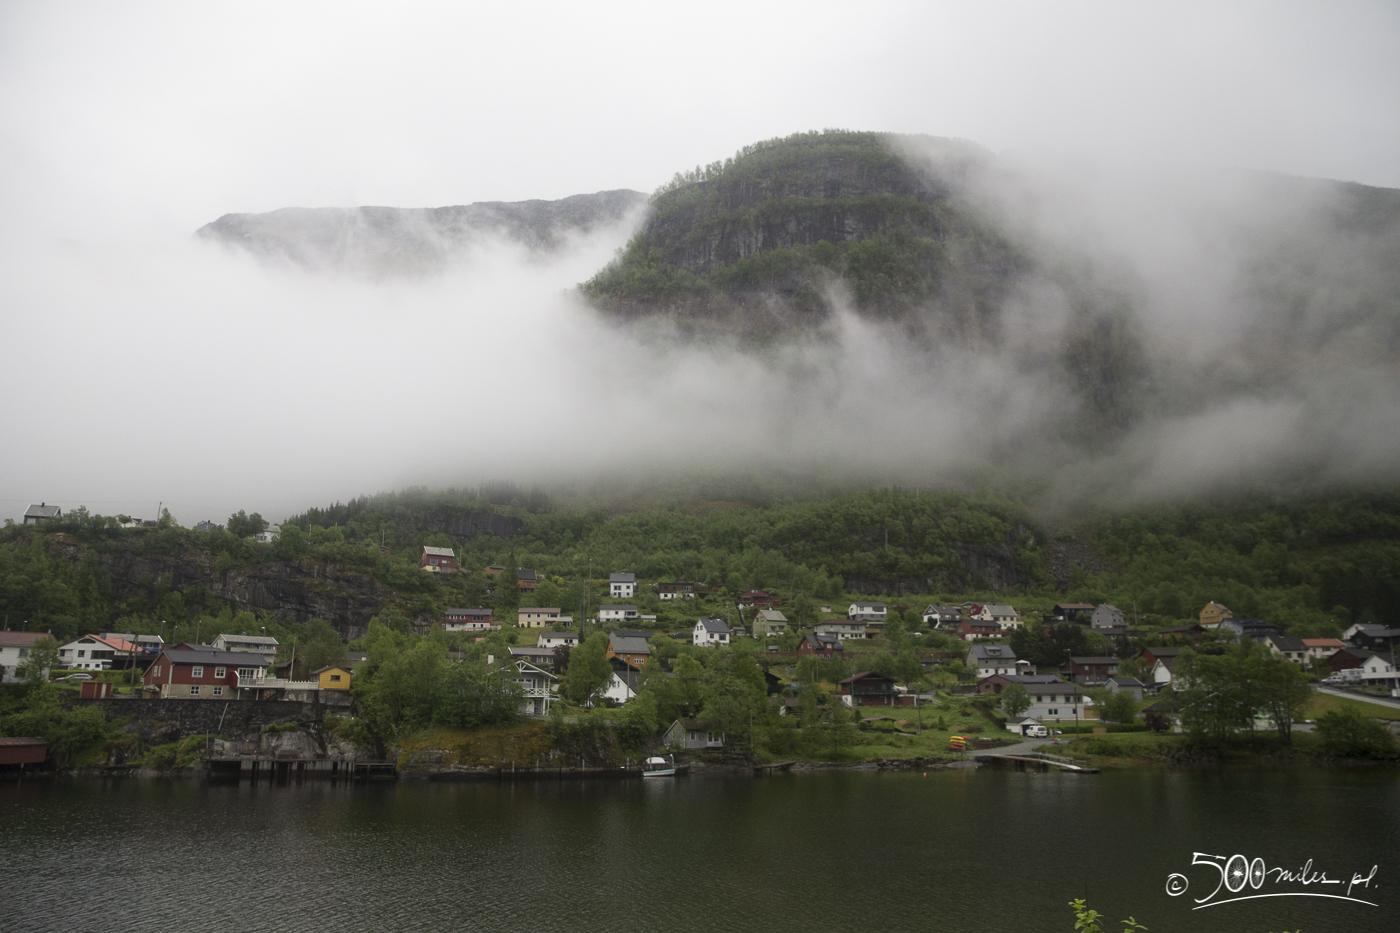 Oslo-Bergen train ride - foggy landscape and village